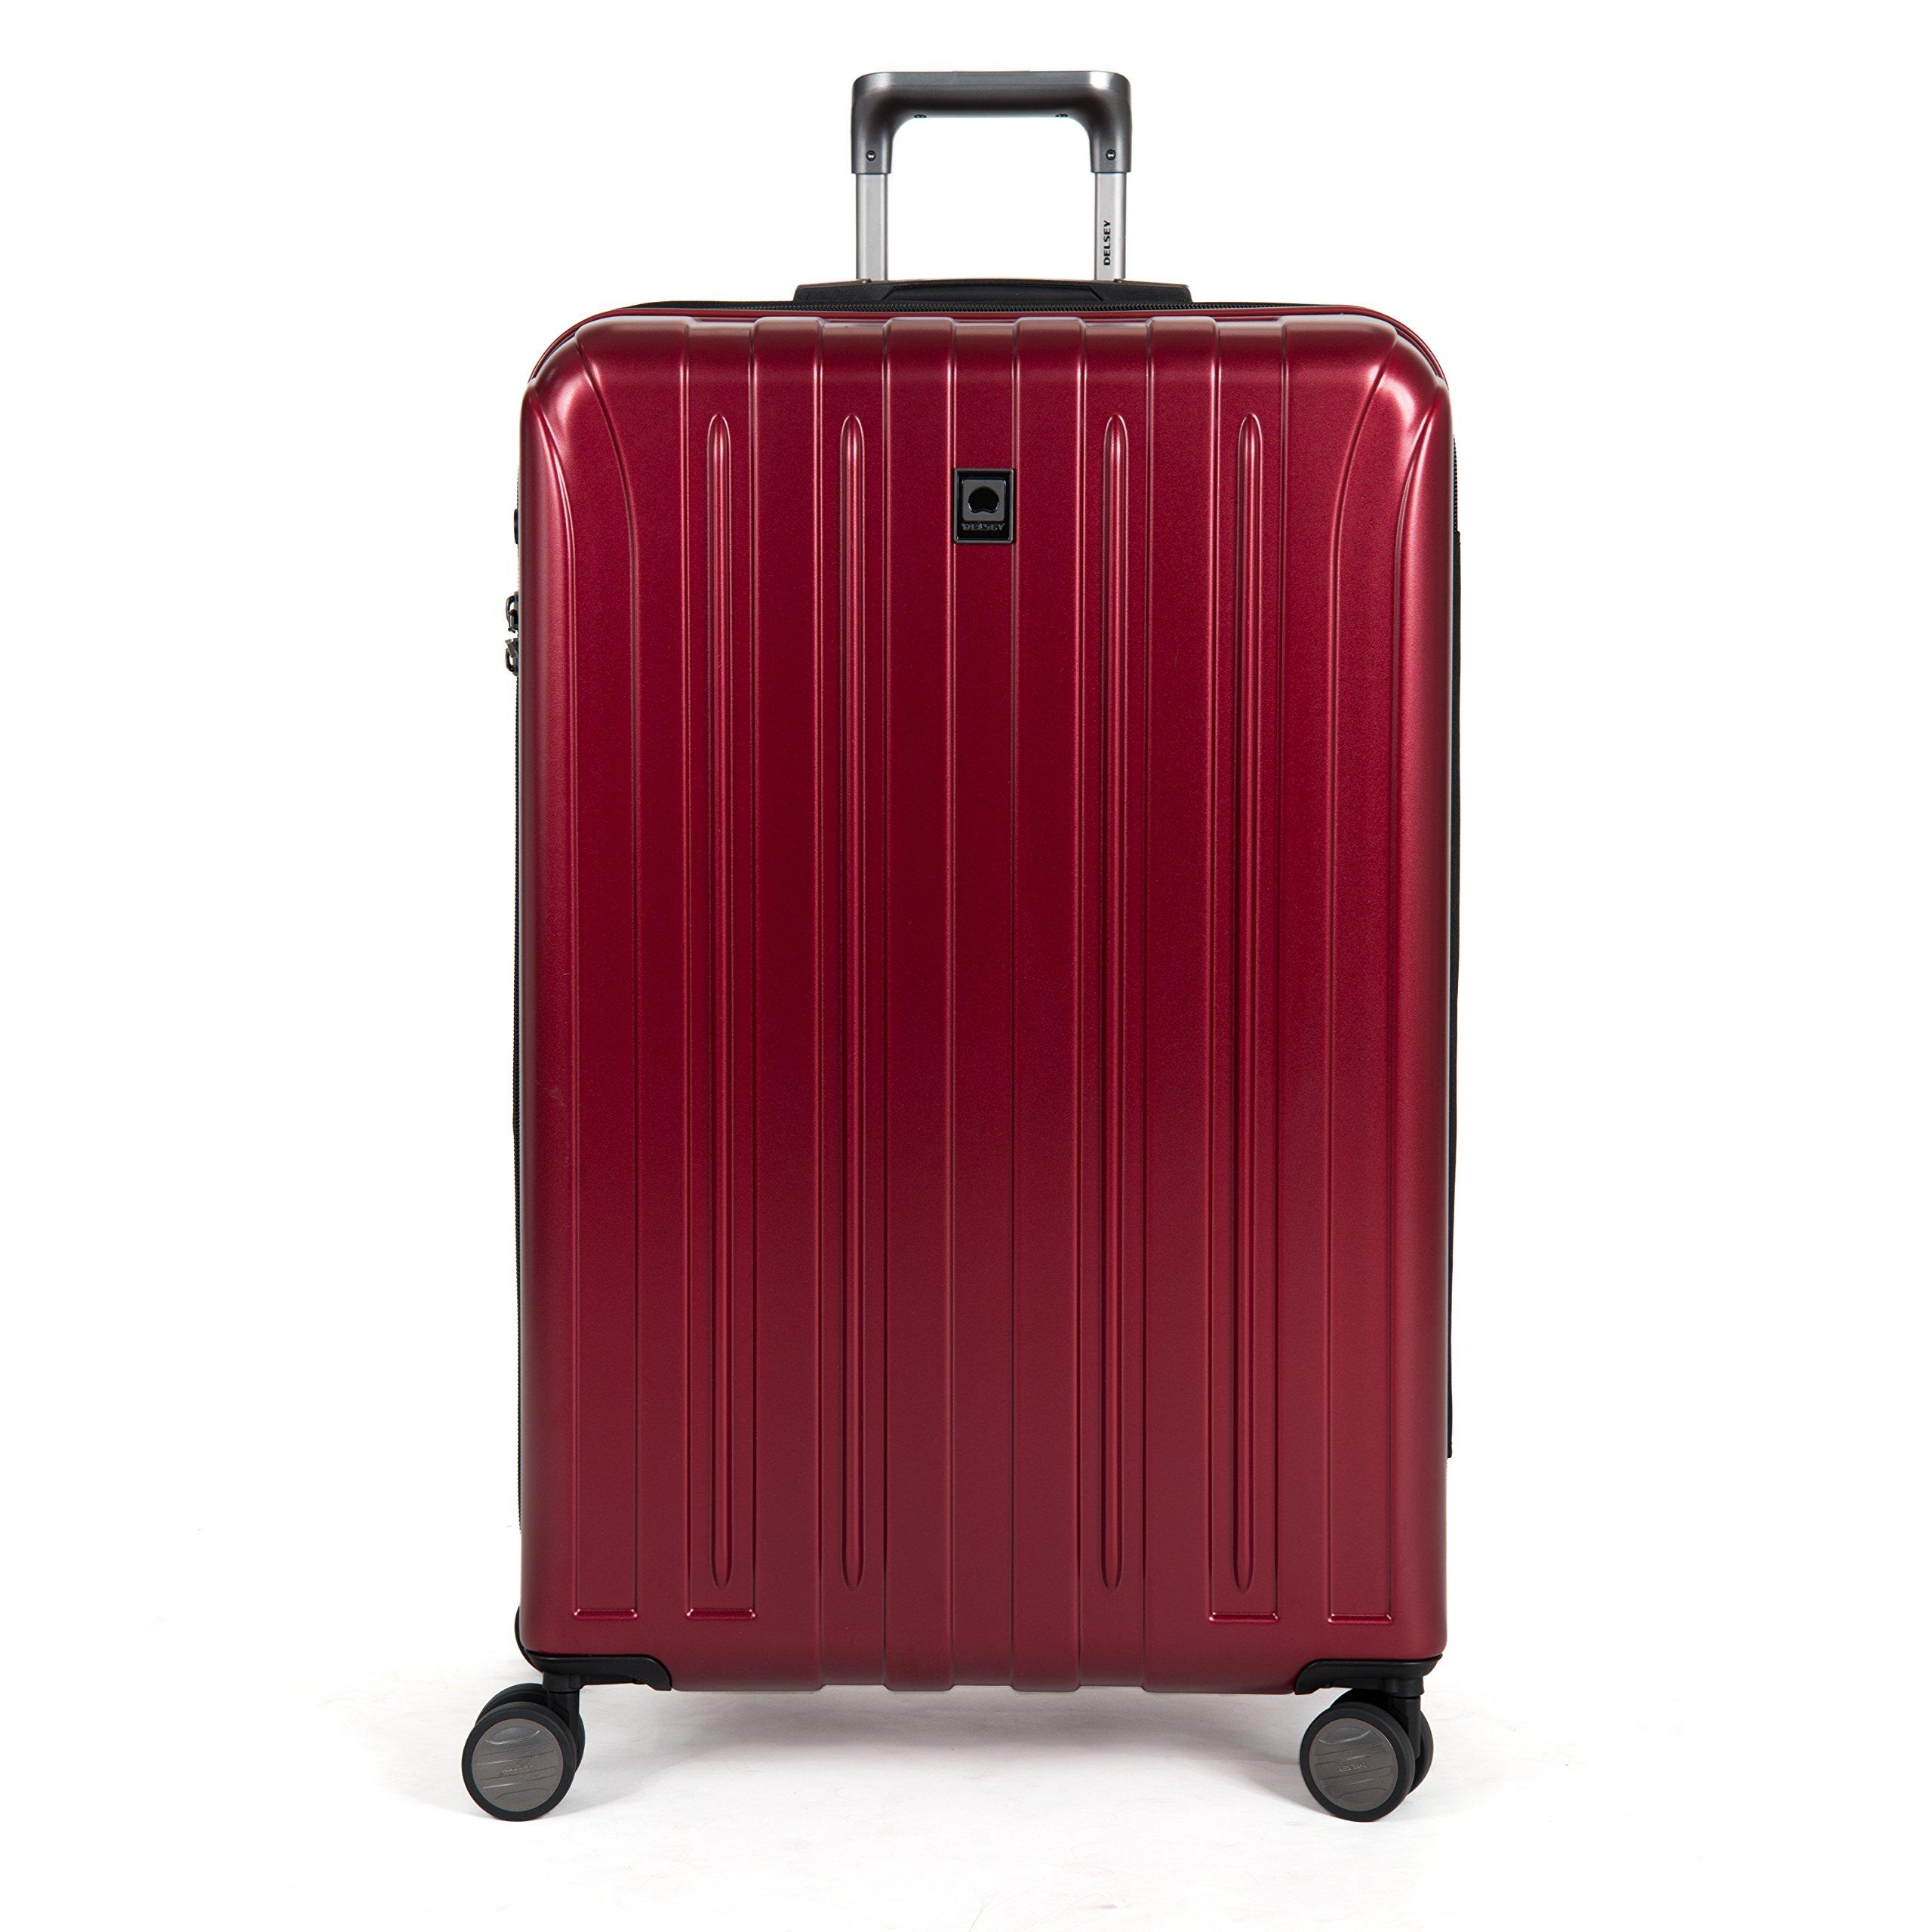 DELSEY Paris Luggage Helium Titanium 29'' Exp. Spinner Trolley Hard Case Suitcase, Black Cherry, One Size